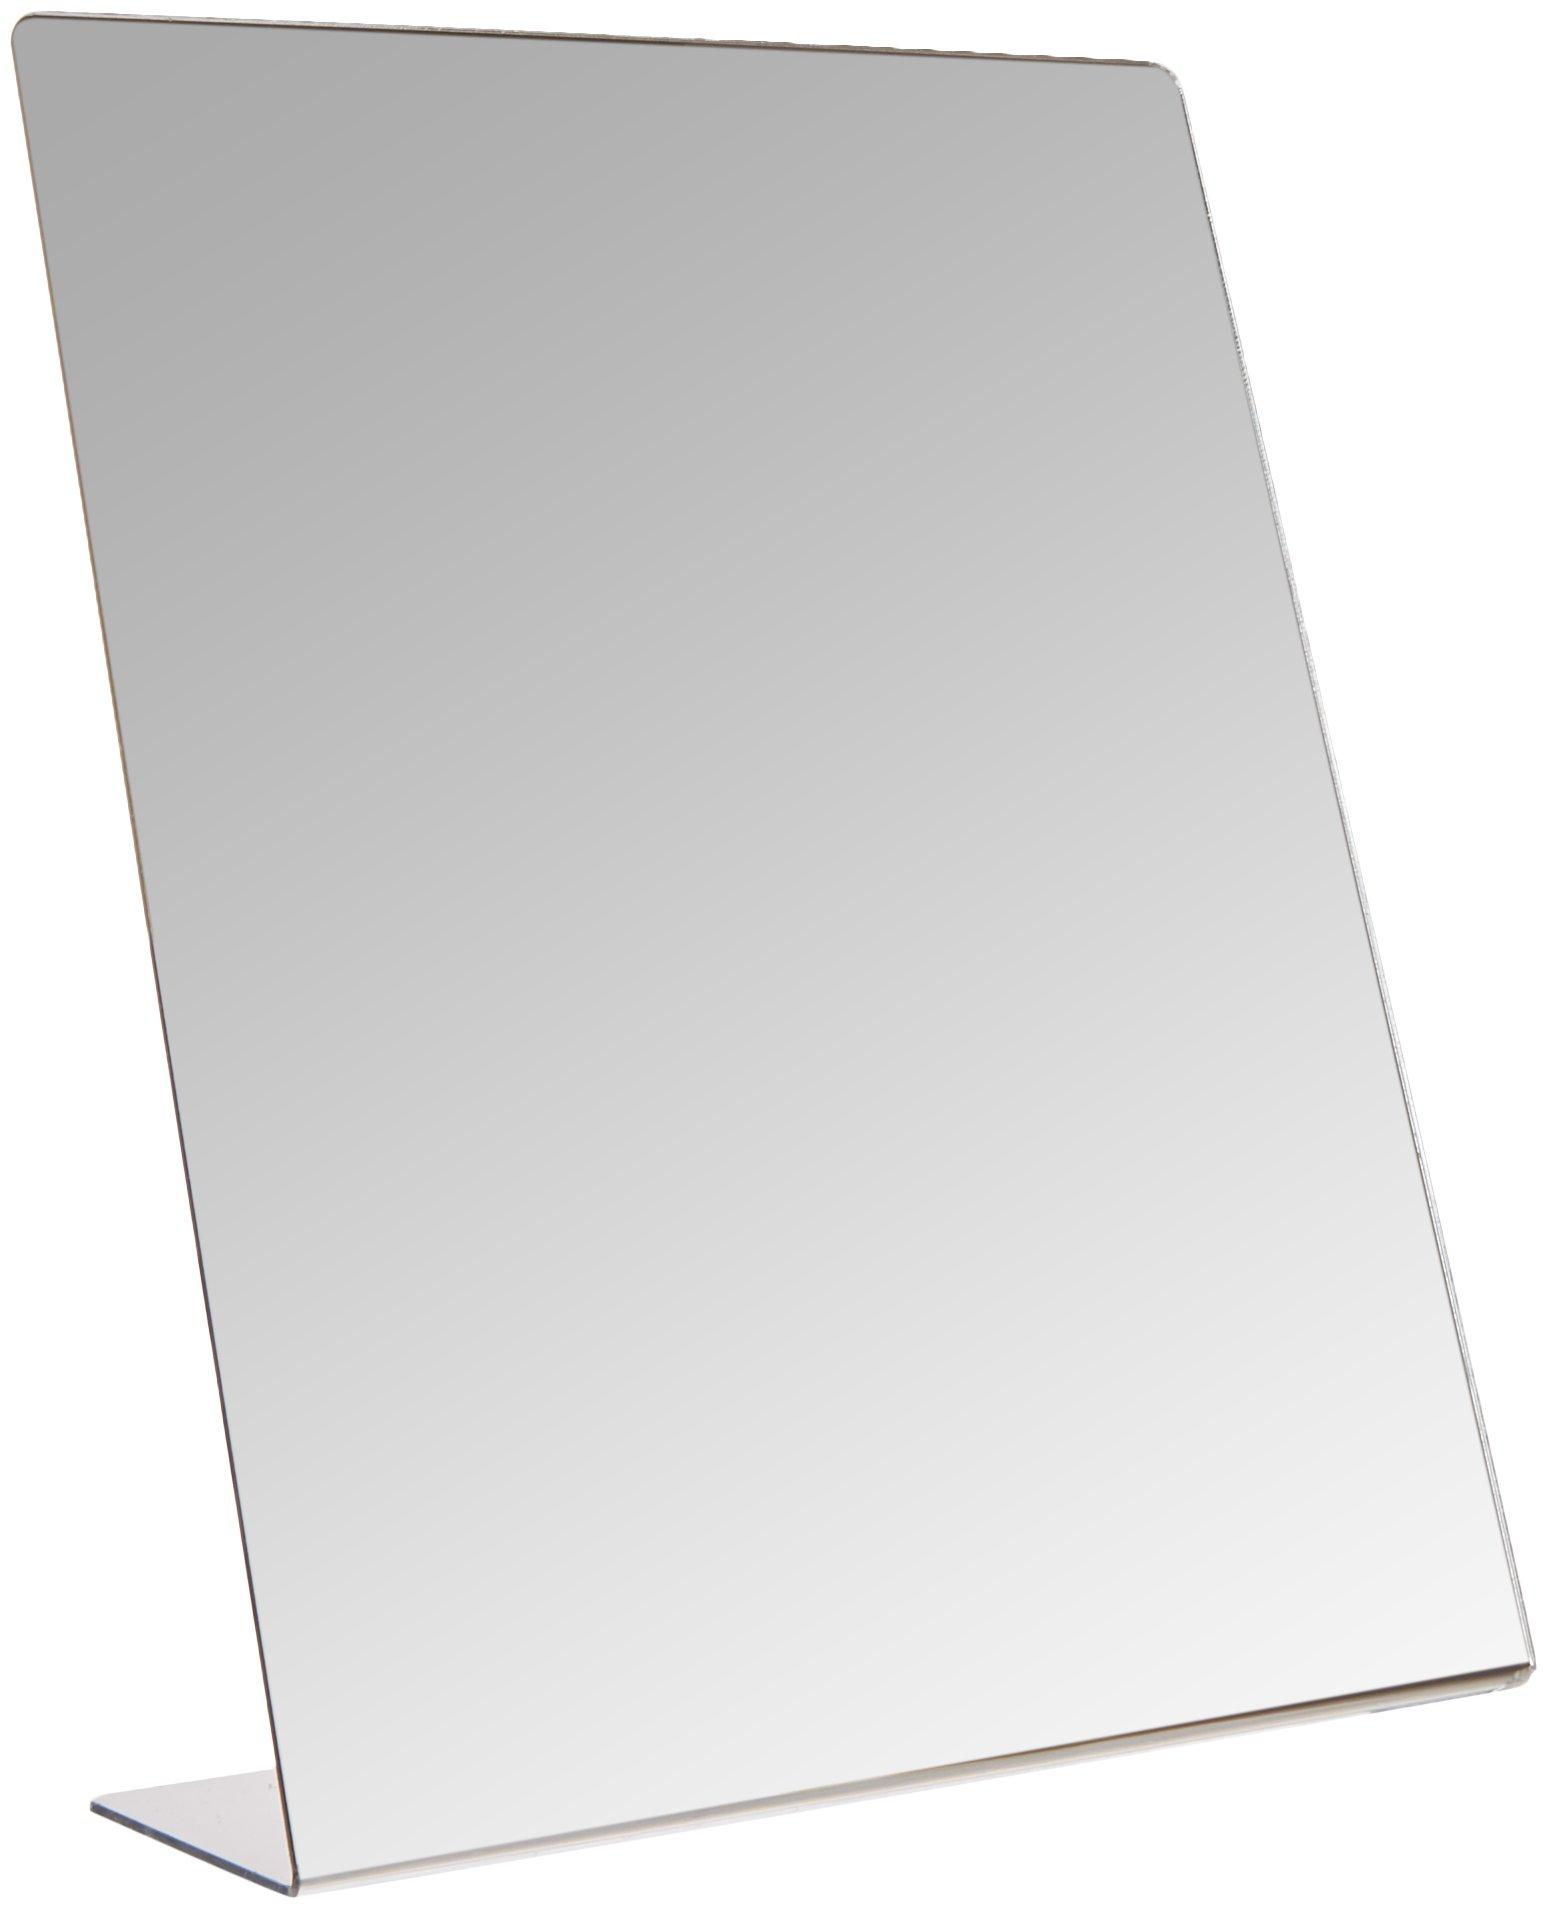 Self Portrait Mirrors Single